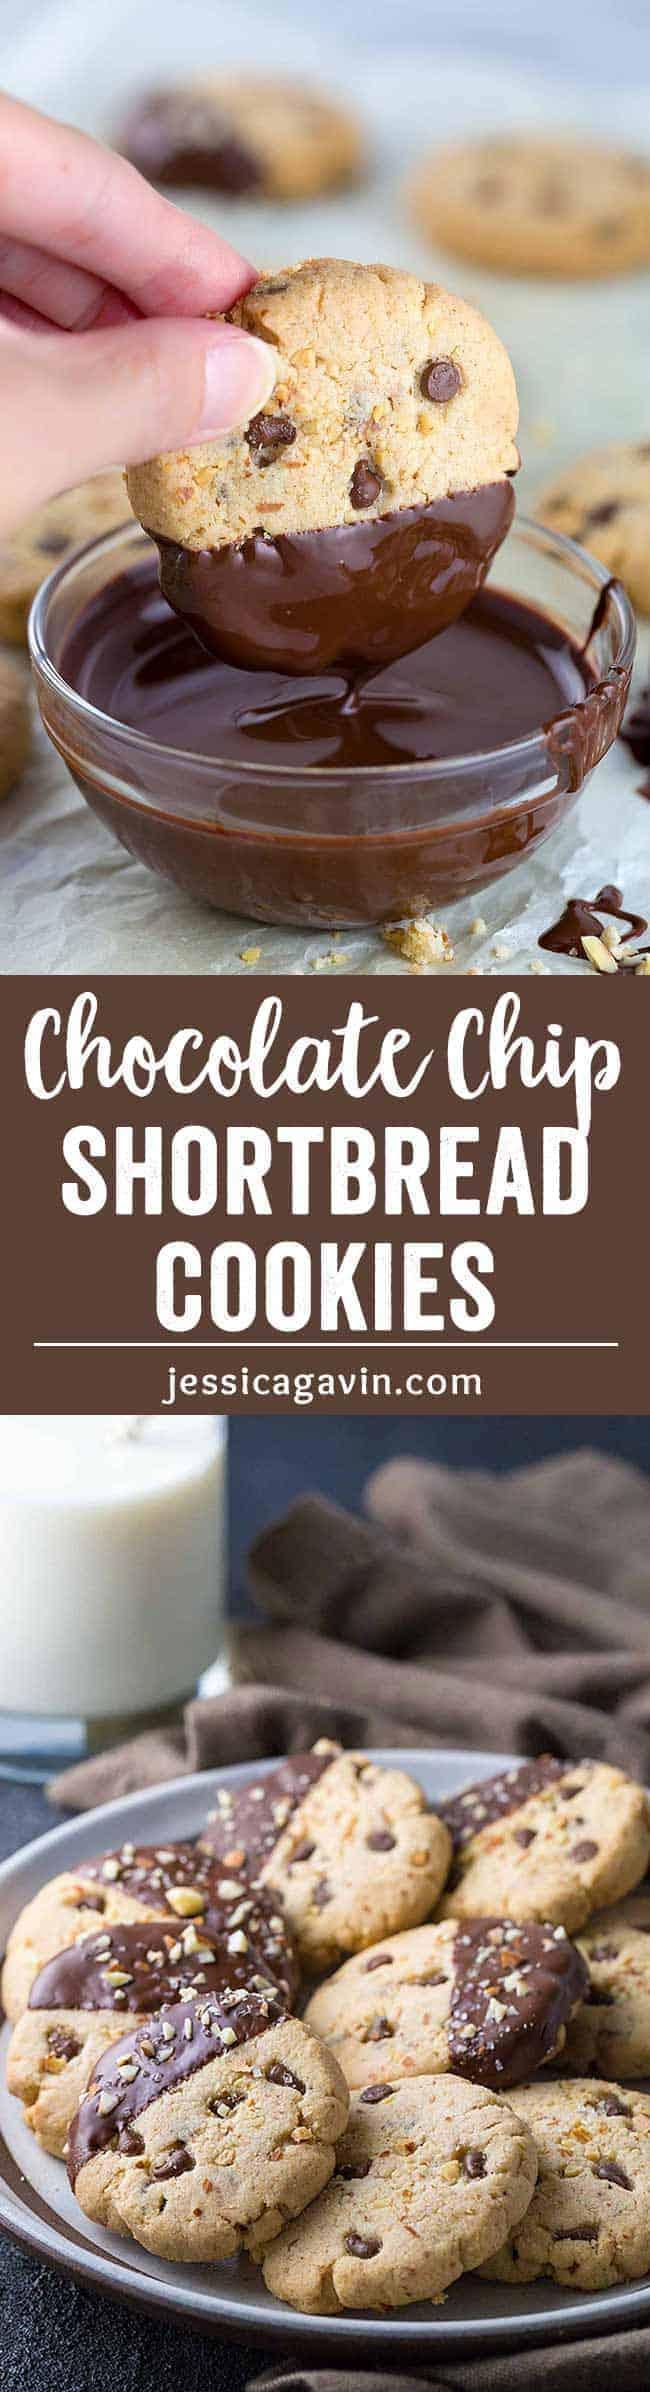 Gluten Free Almond Chocolate Chip Shortbread Cookies | Jessica Gavin